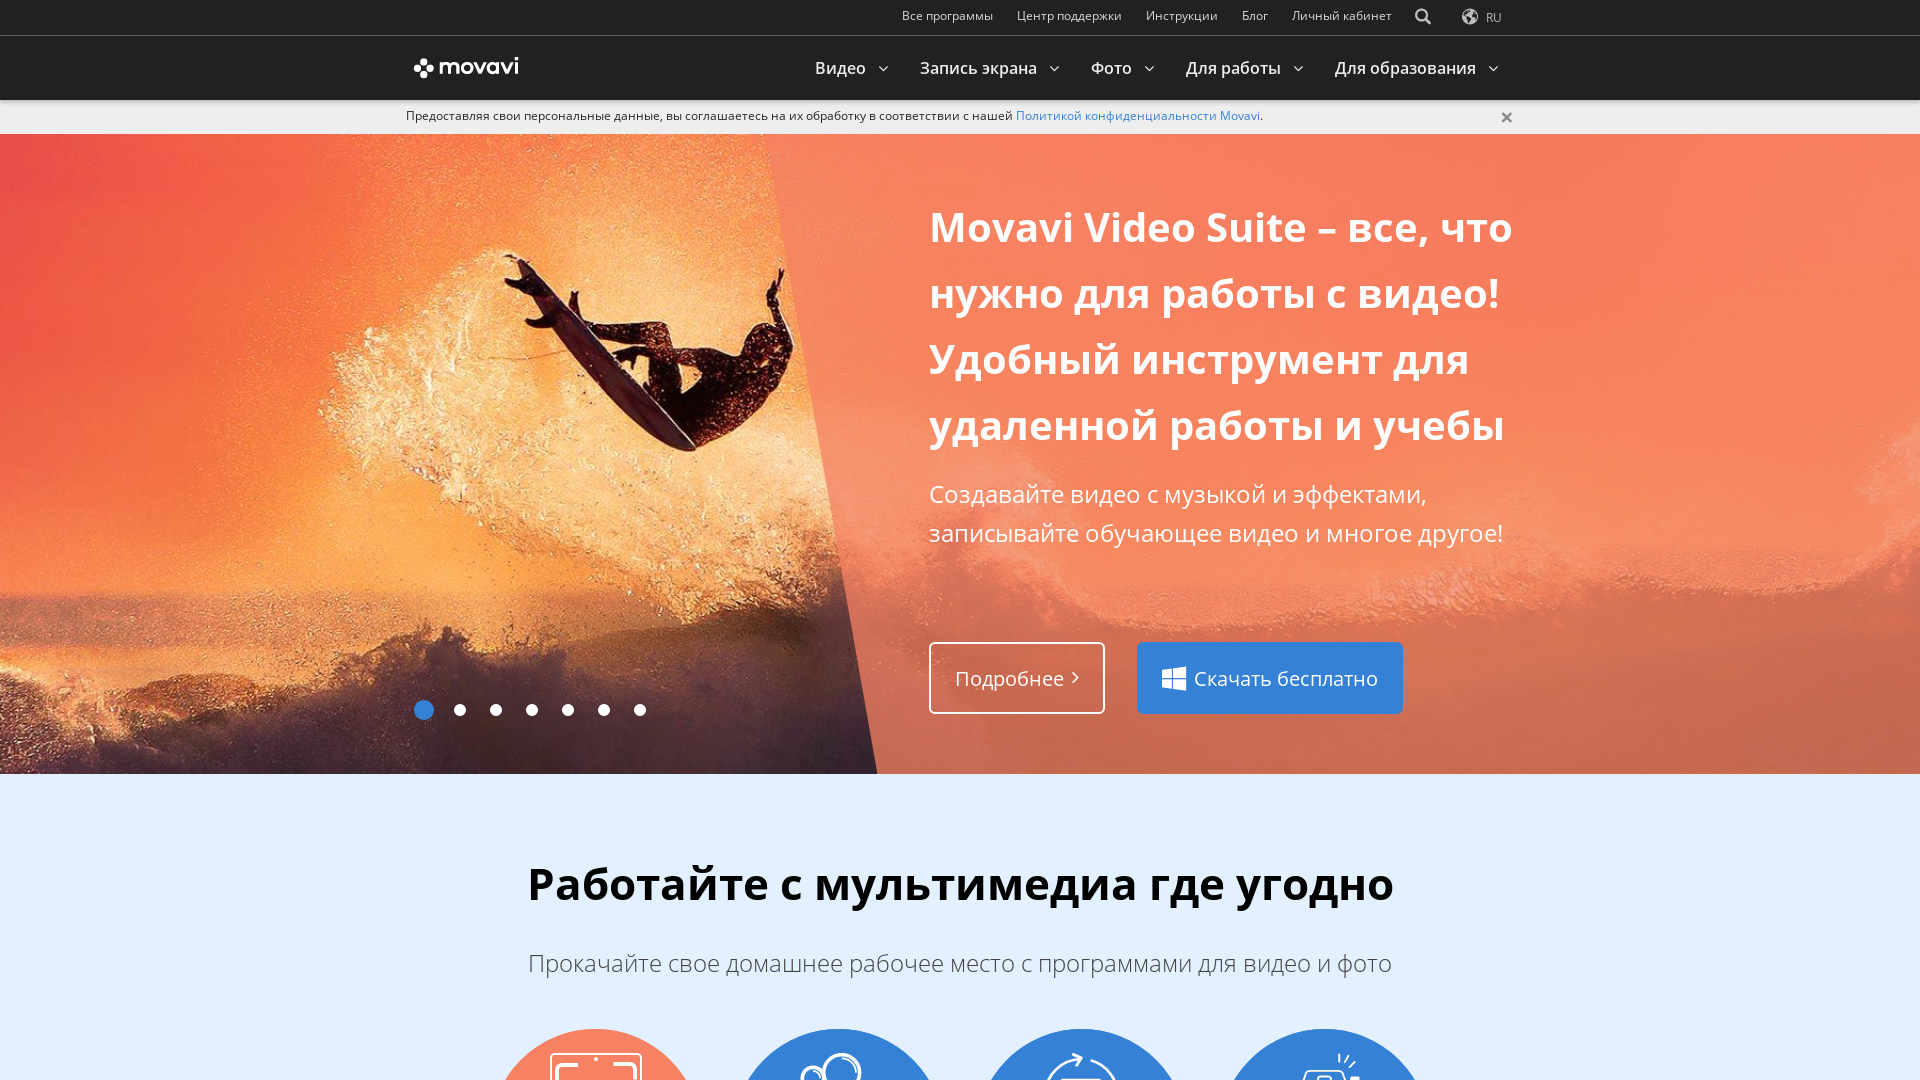 Movavi Ad website